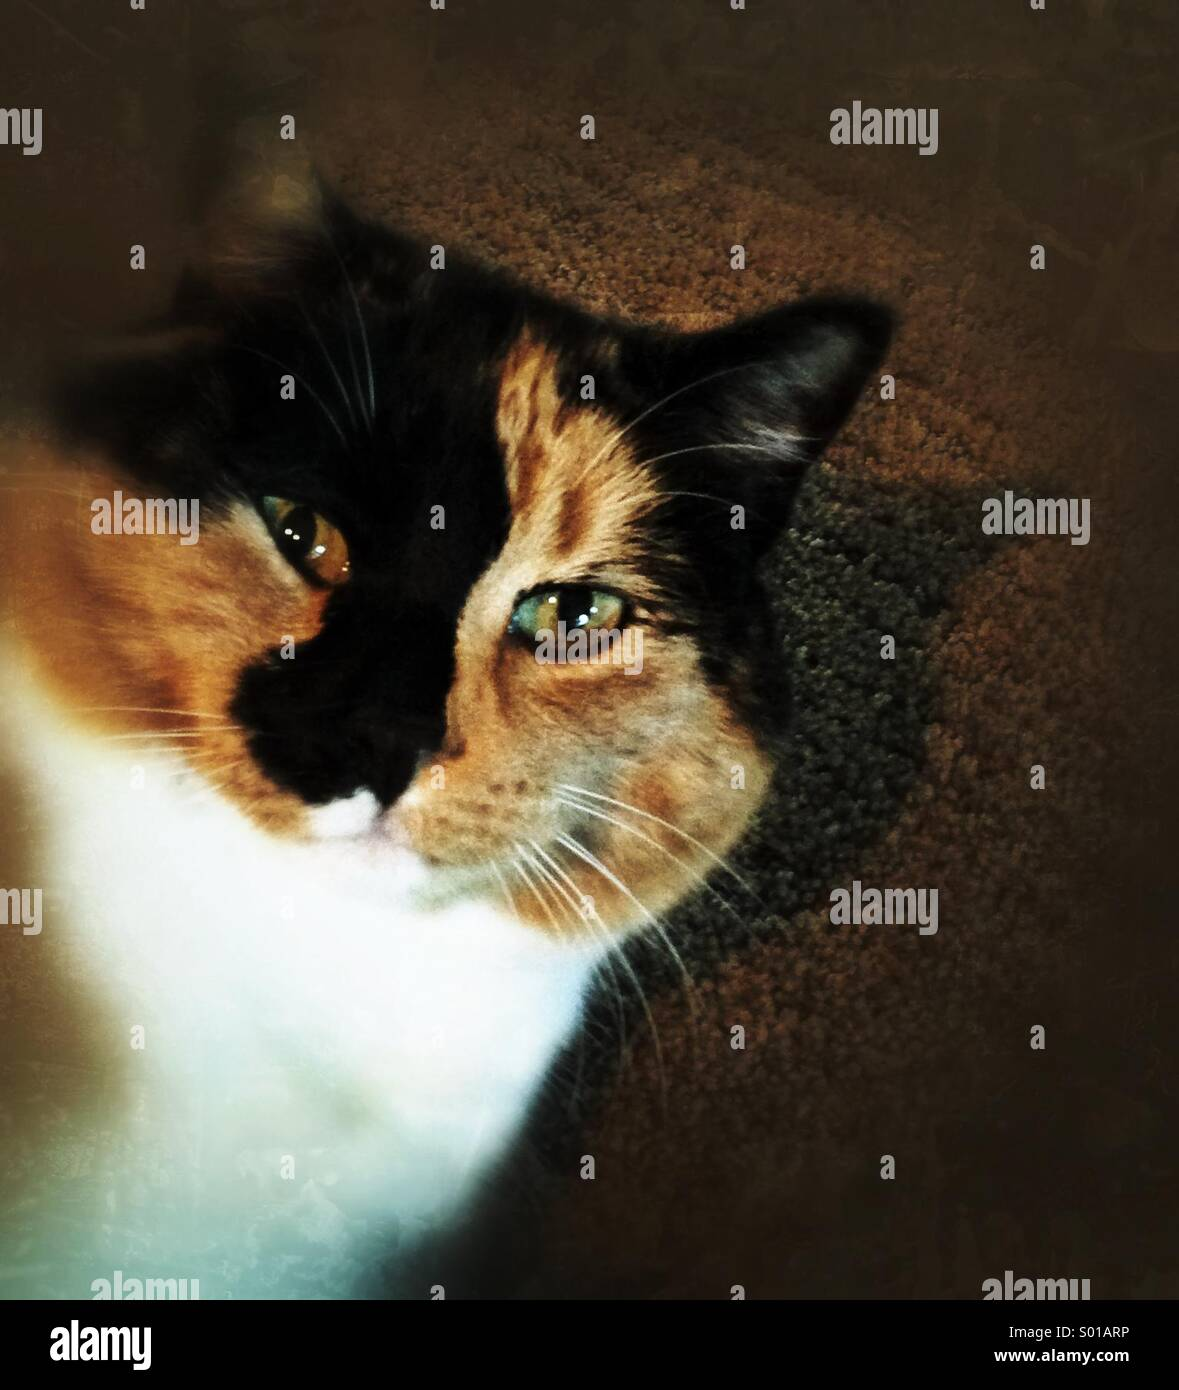 A cute calico cat. - Stock Image